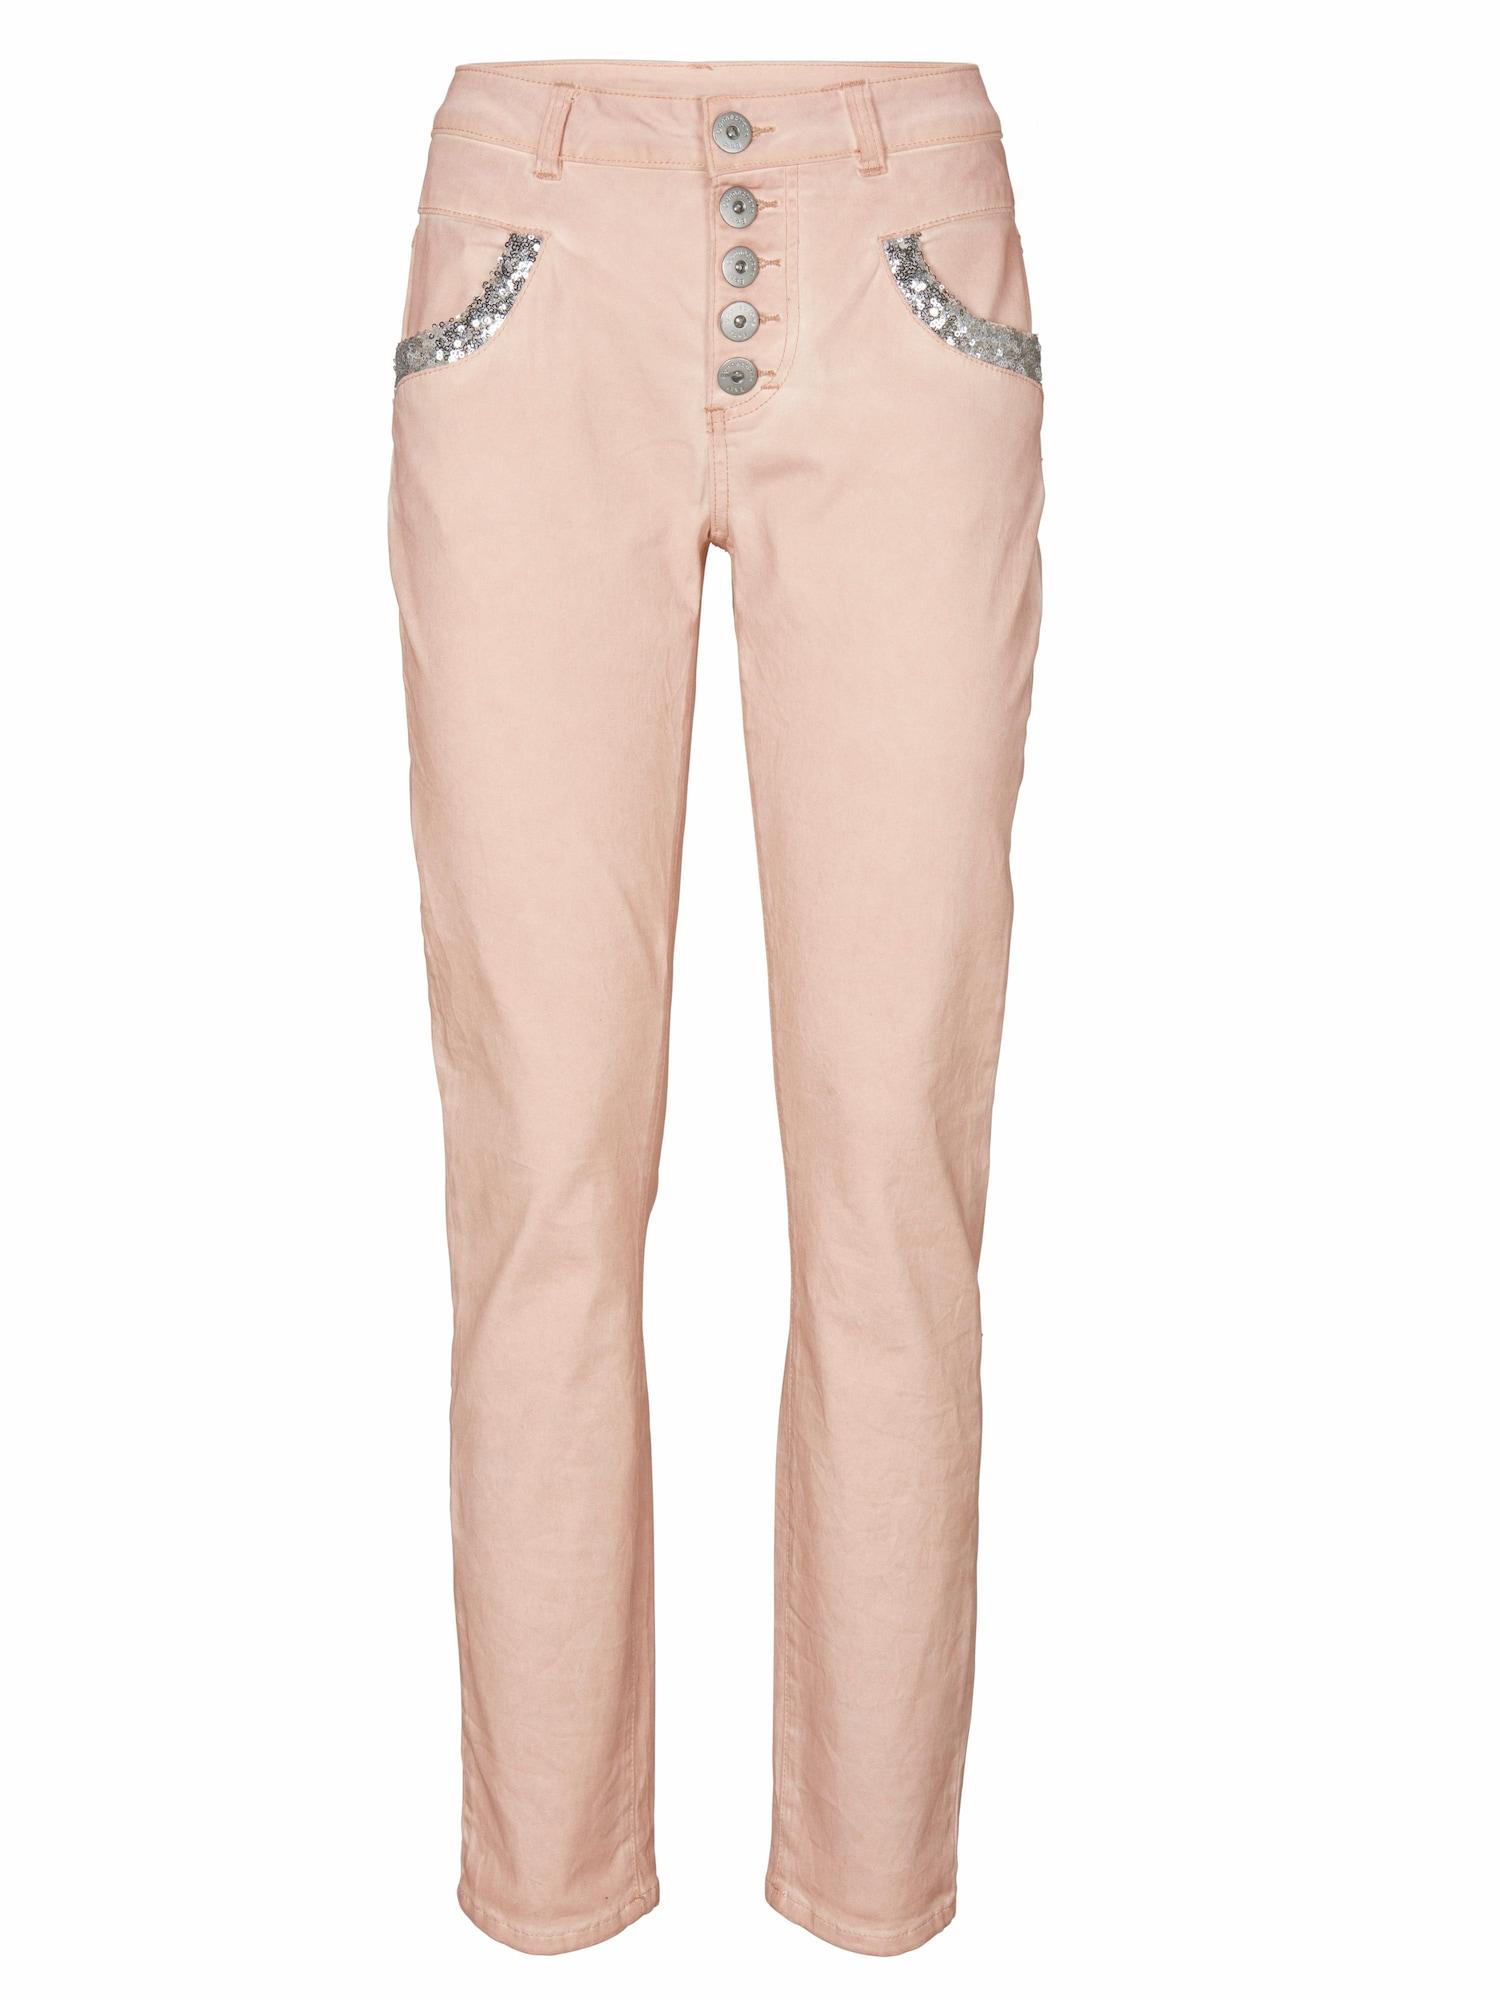 Kalhoty starorůžová stříbrná Heine